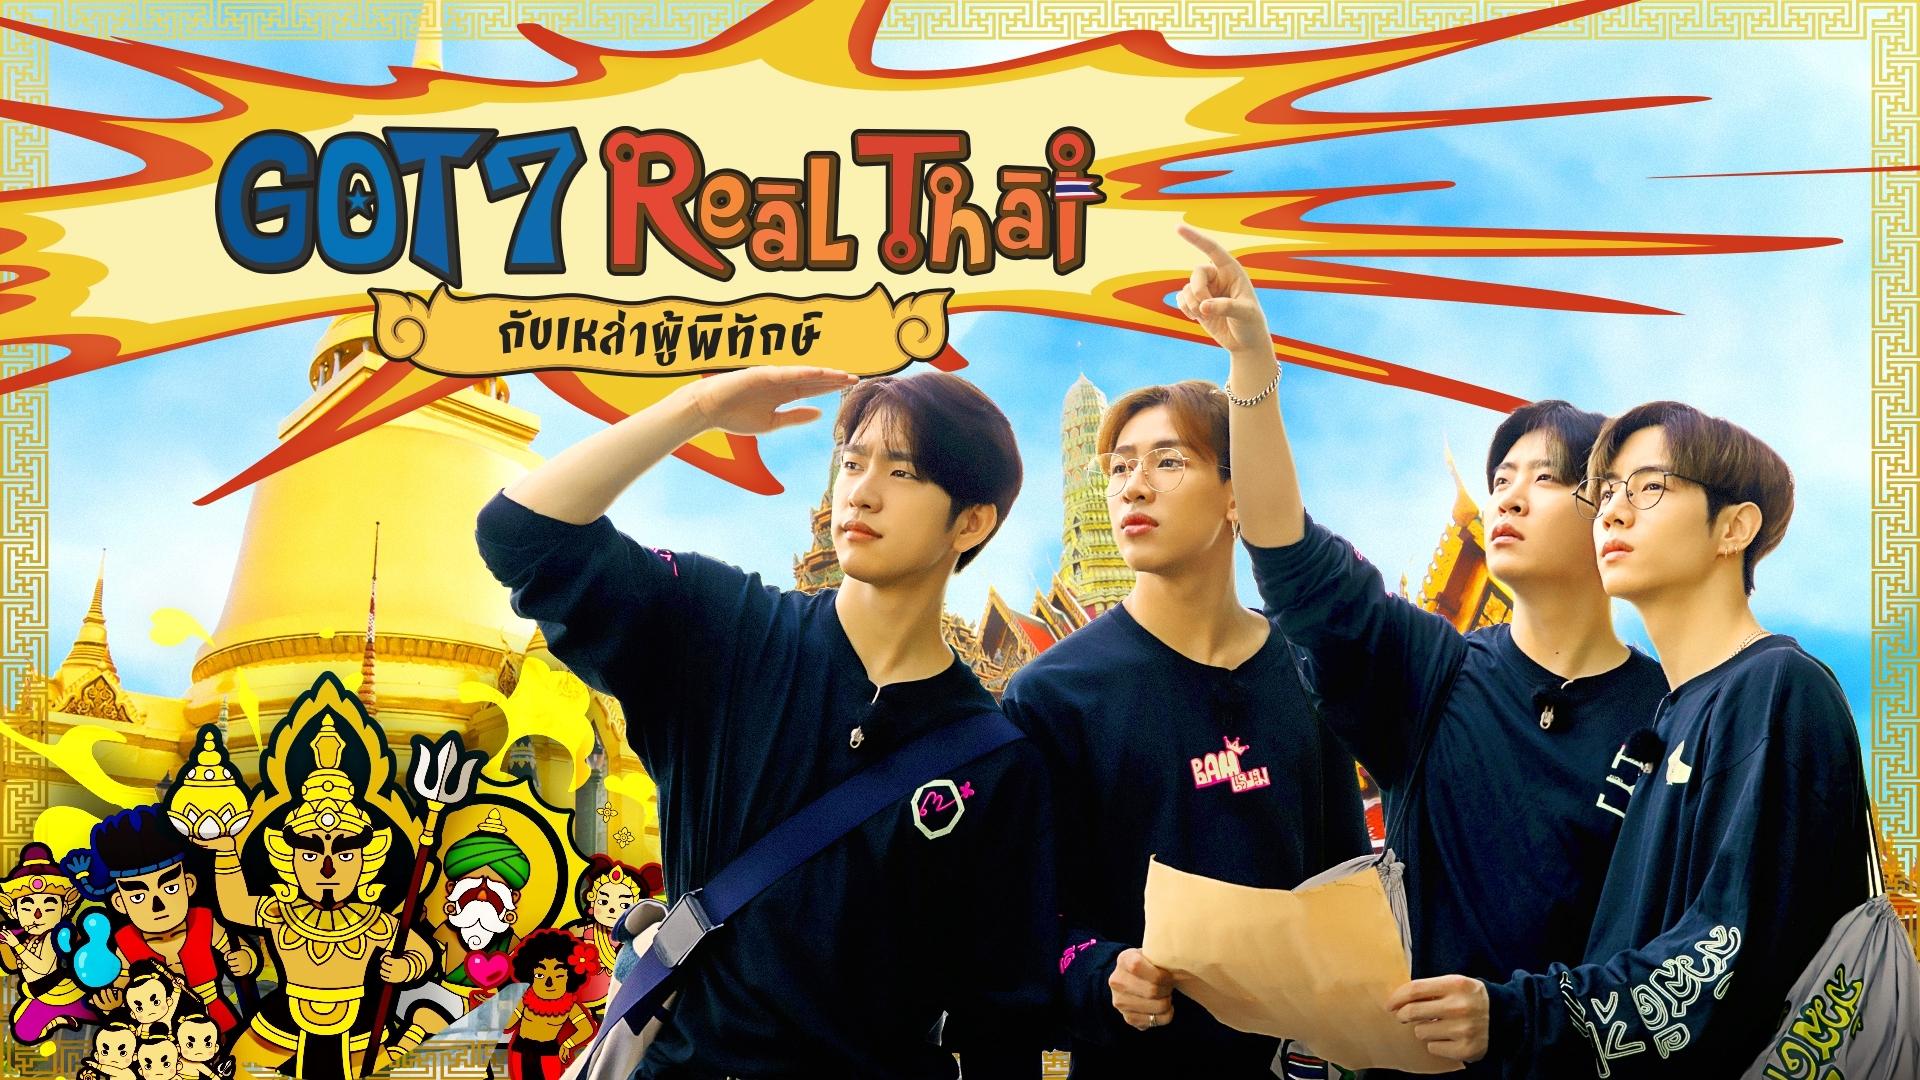 Got7 Real Thai กับเหล่าผู้พิทักษ์ Got7 Real Thai กับเหล่าผู้พิทักษ์ ตอนที่ 1